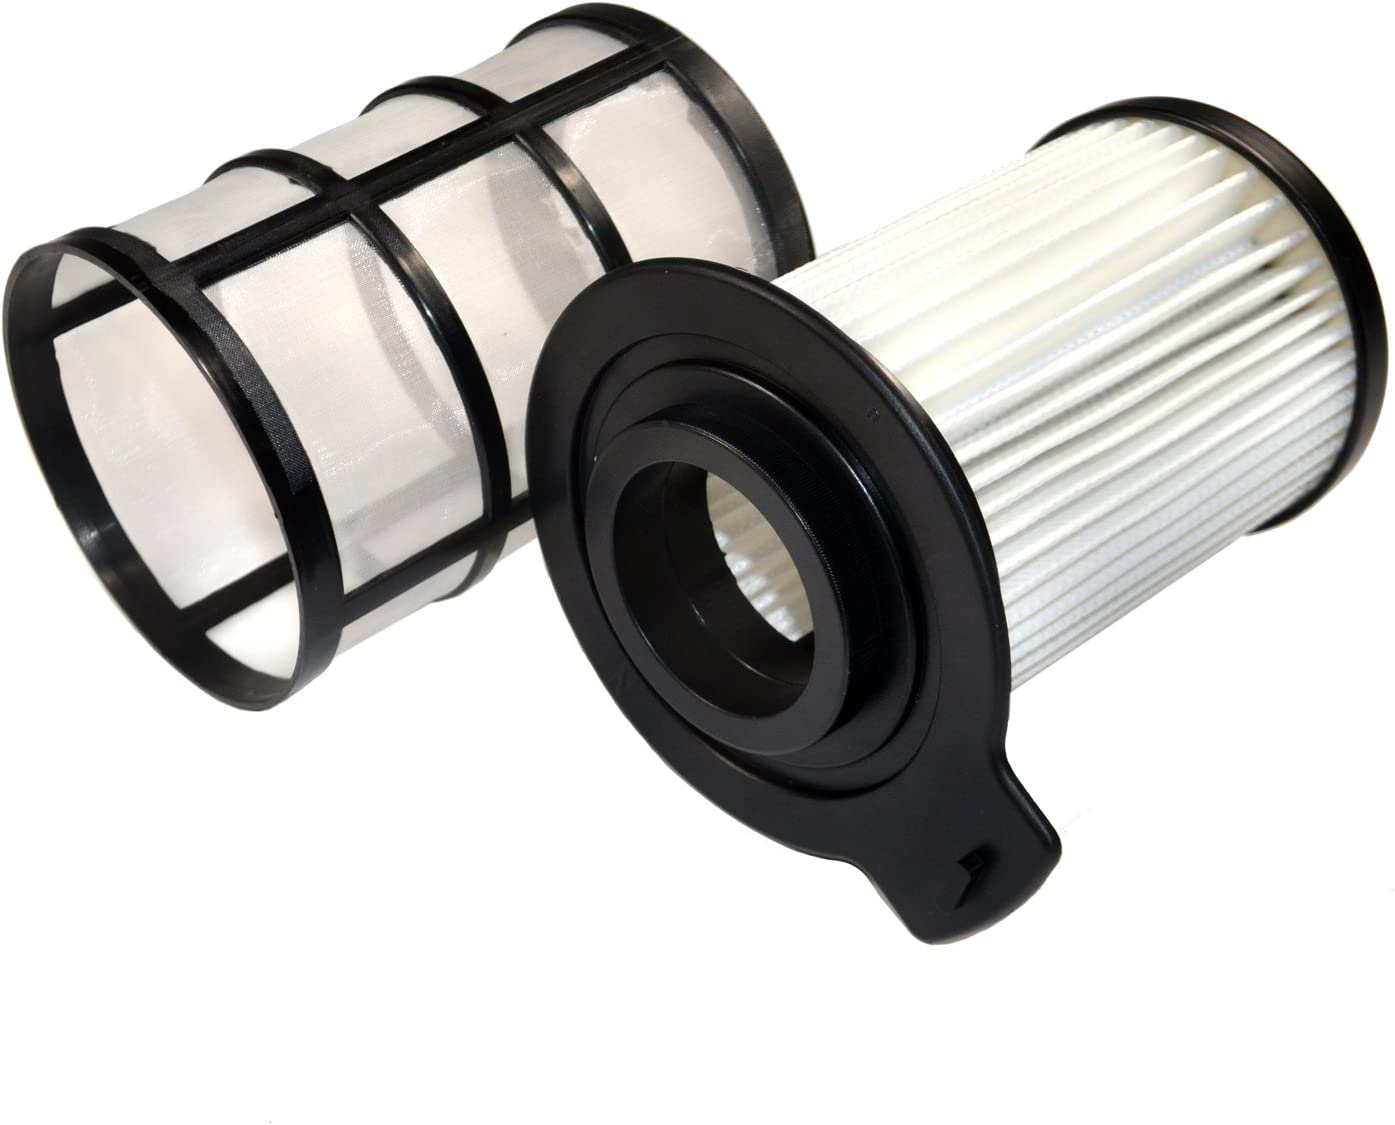 V-091PA HQRP Central HEPA Filter for Vax Performance Pets V-091P HQRP Coaster V-091PB V-091PBA Cylinder Vacuum Cleaner